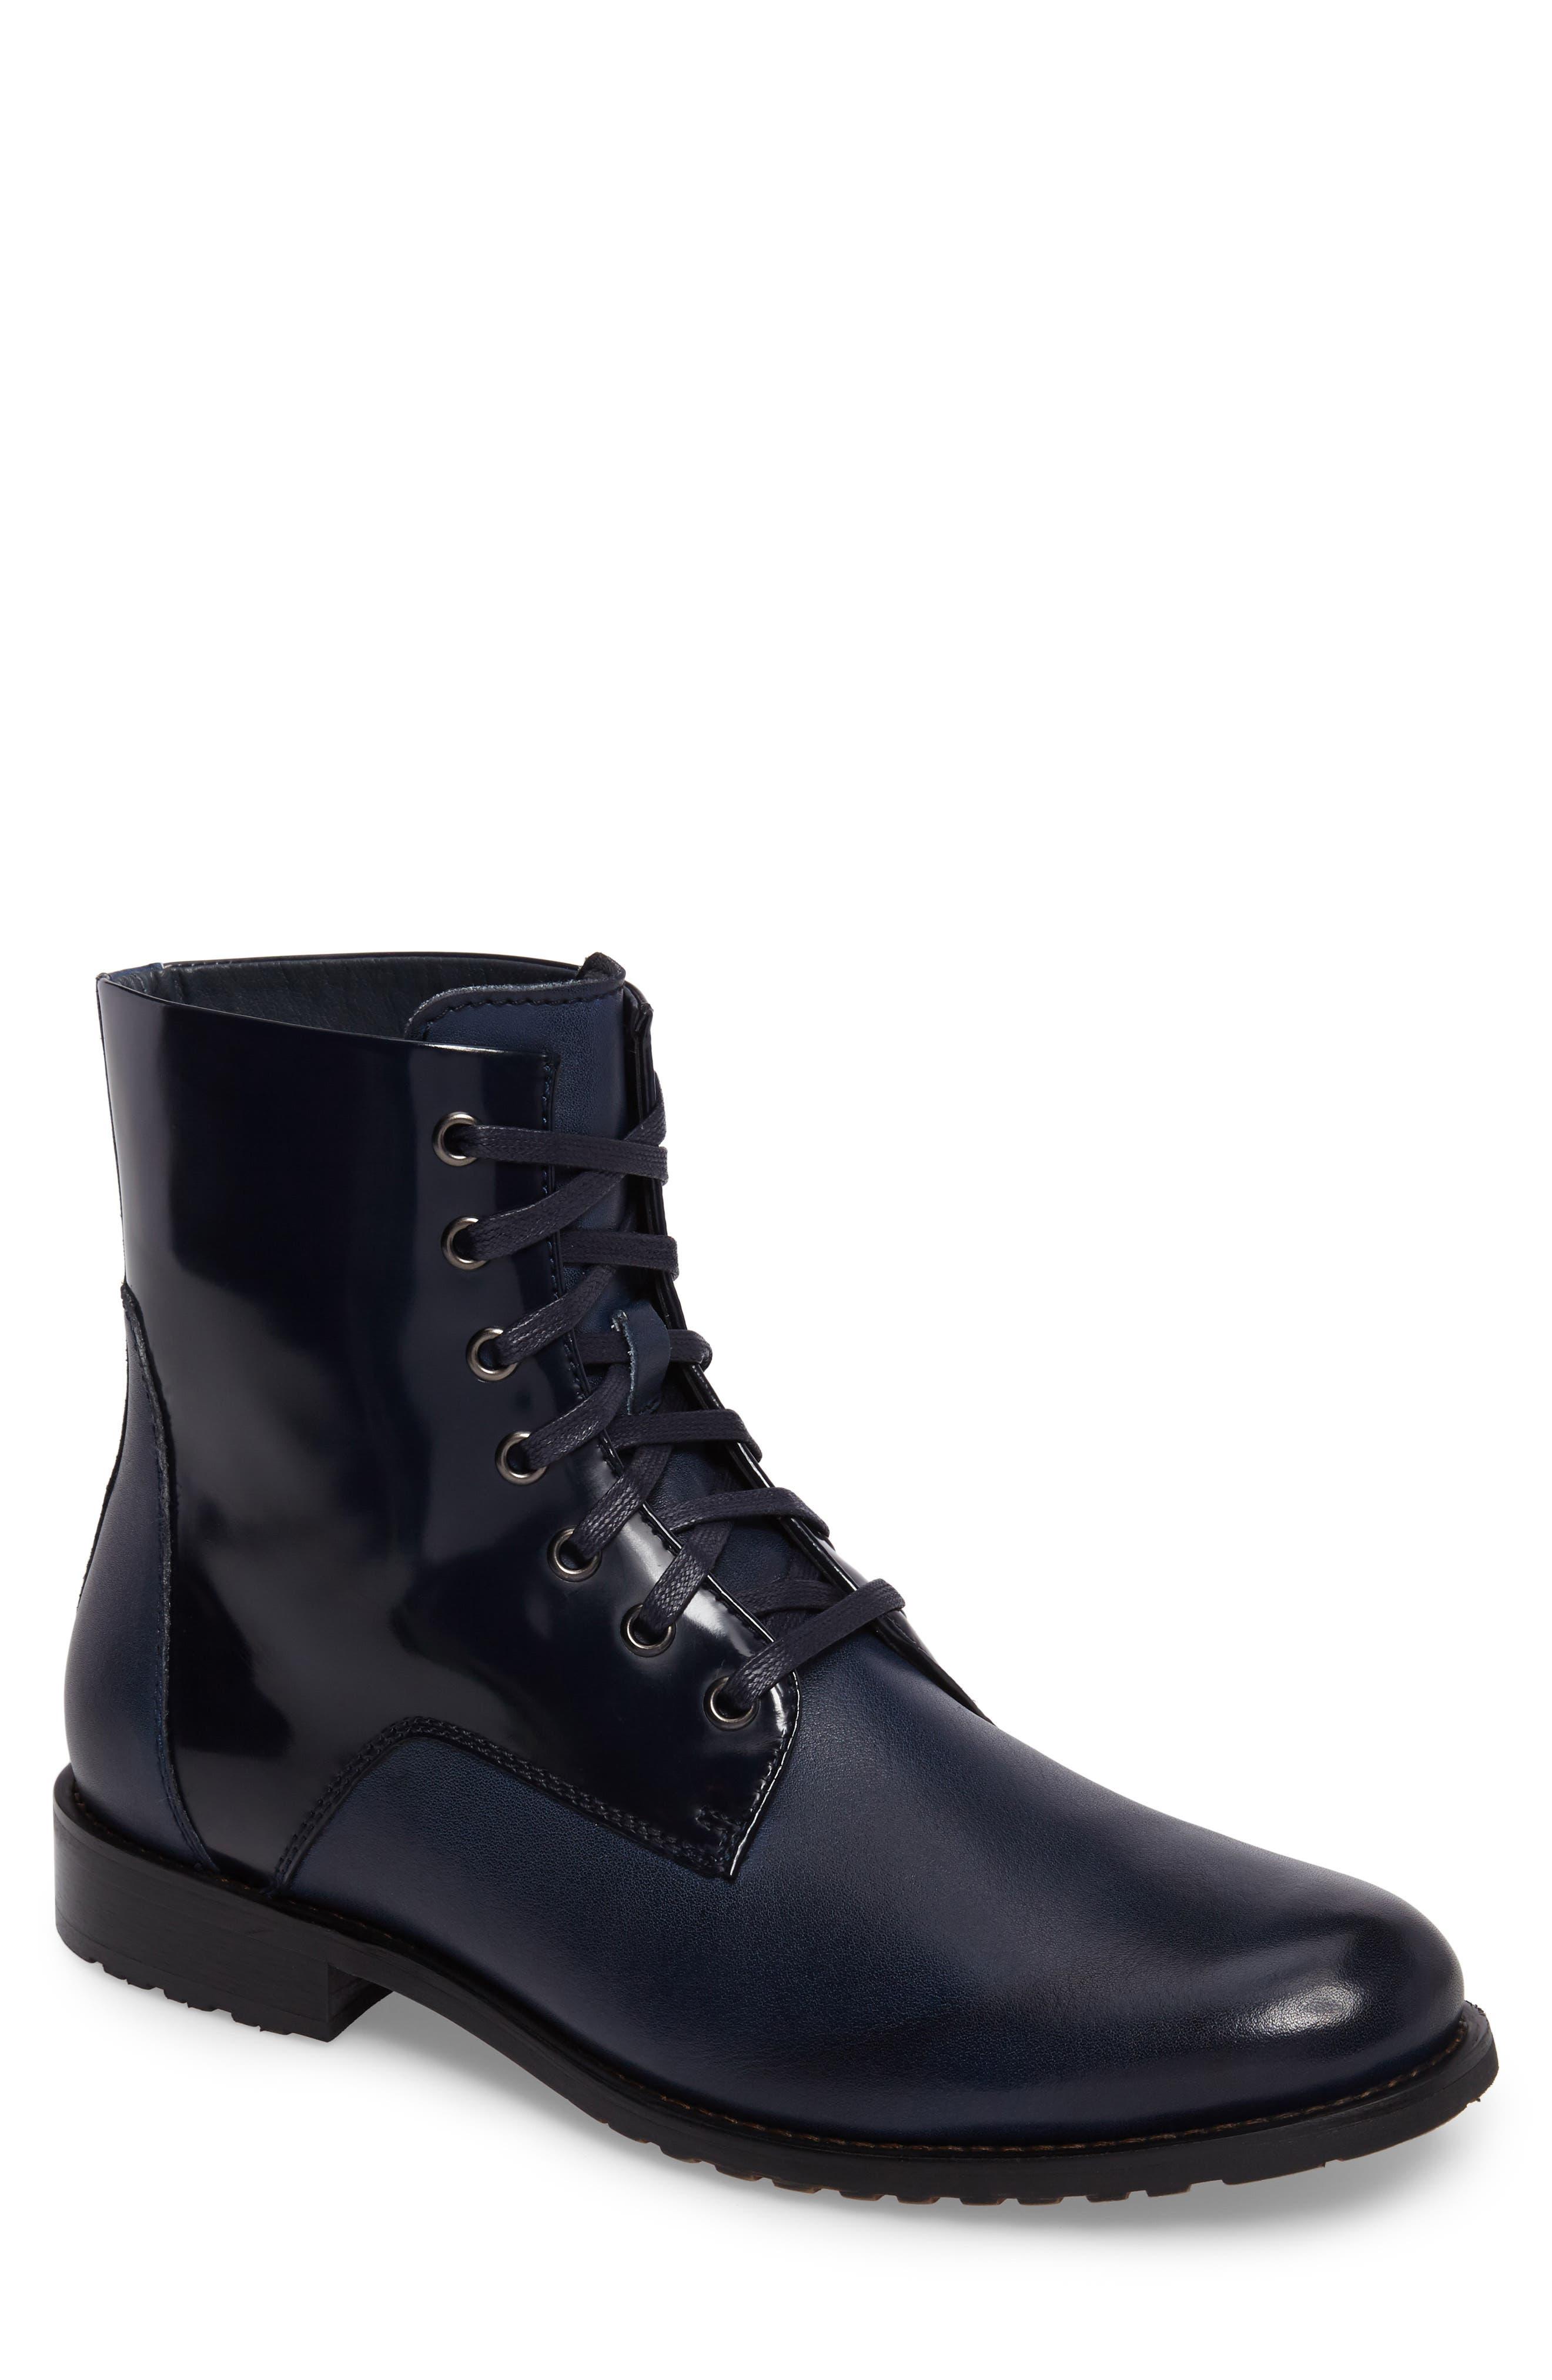 Alternate Image 1 Selected - English Laundry Athol Plain Toe Boot (Men)